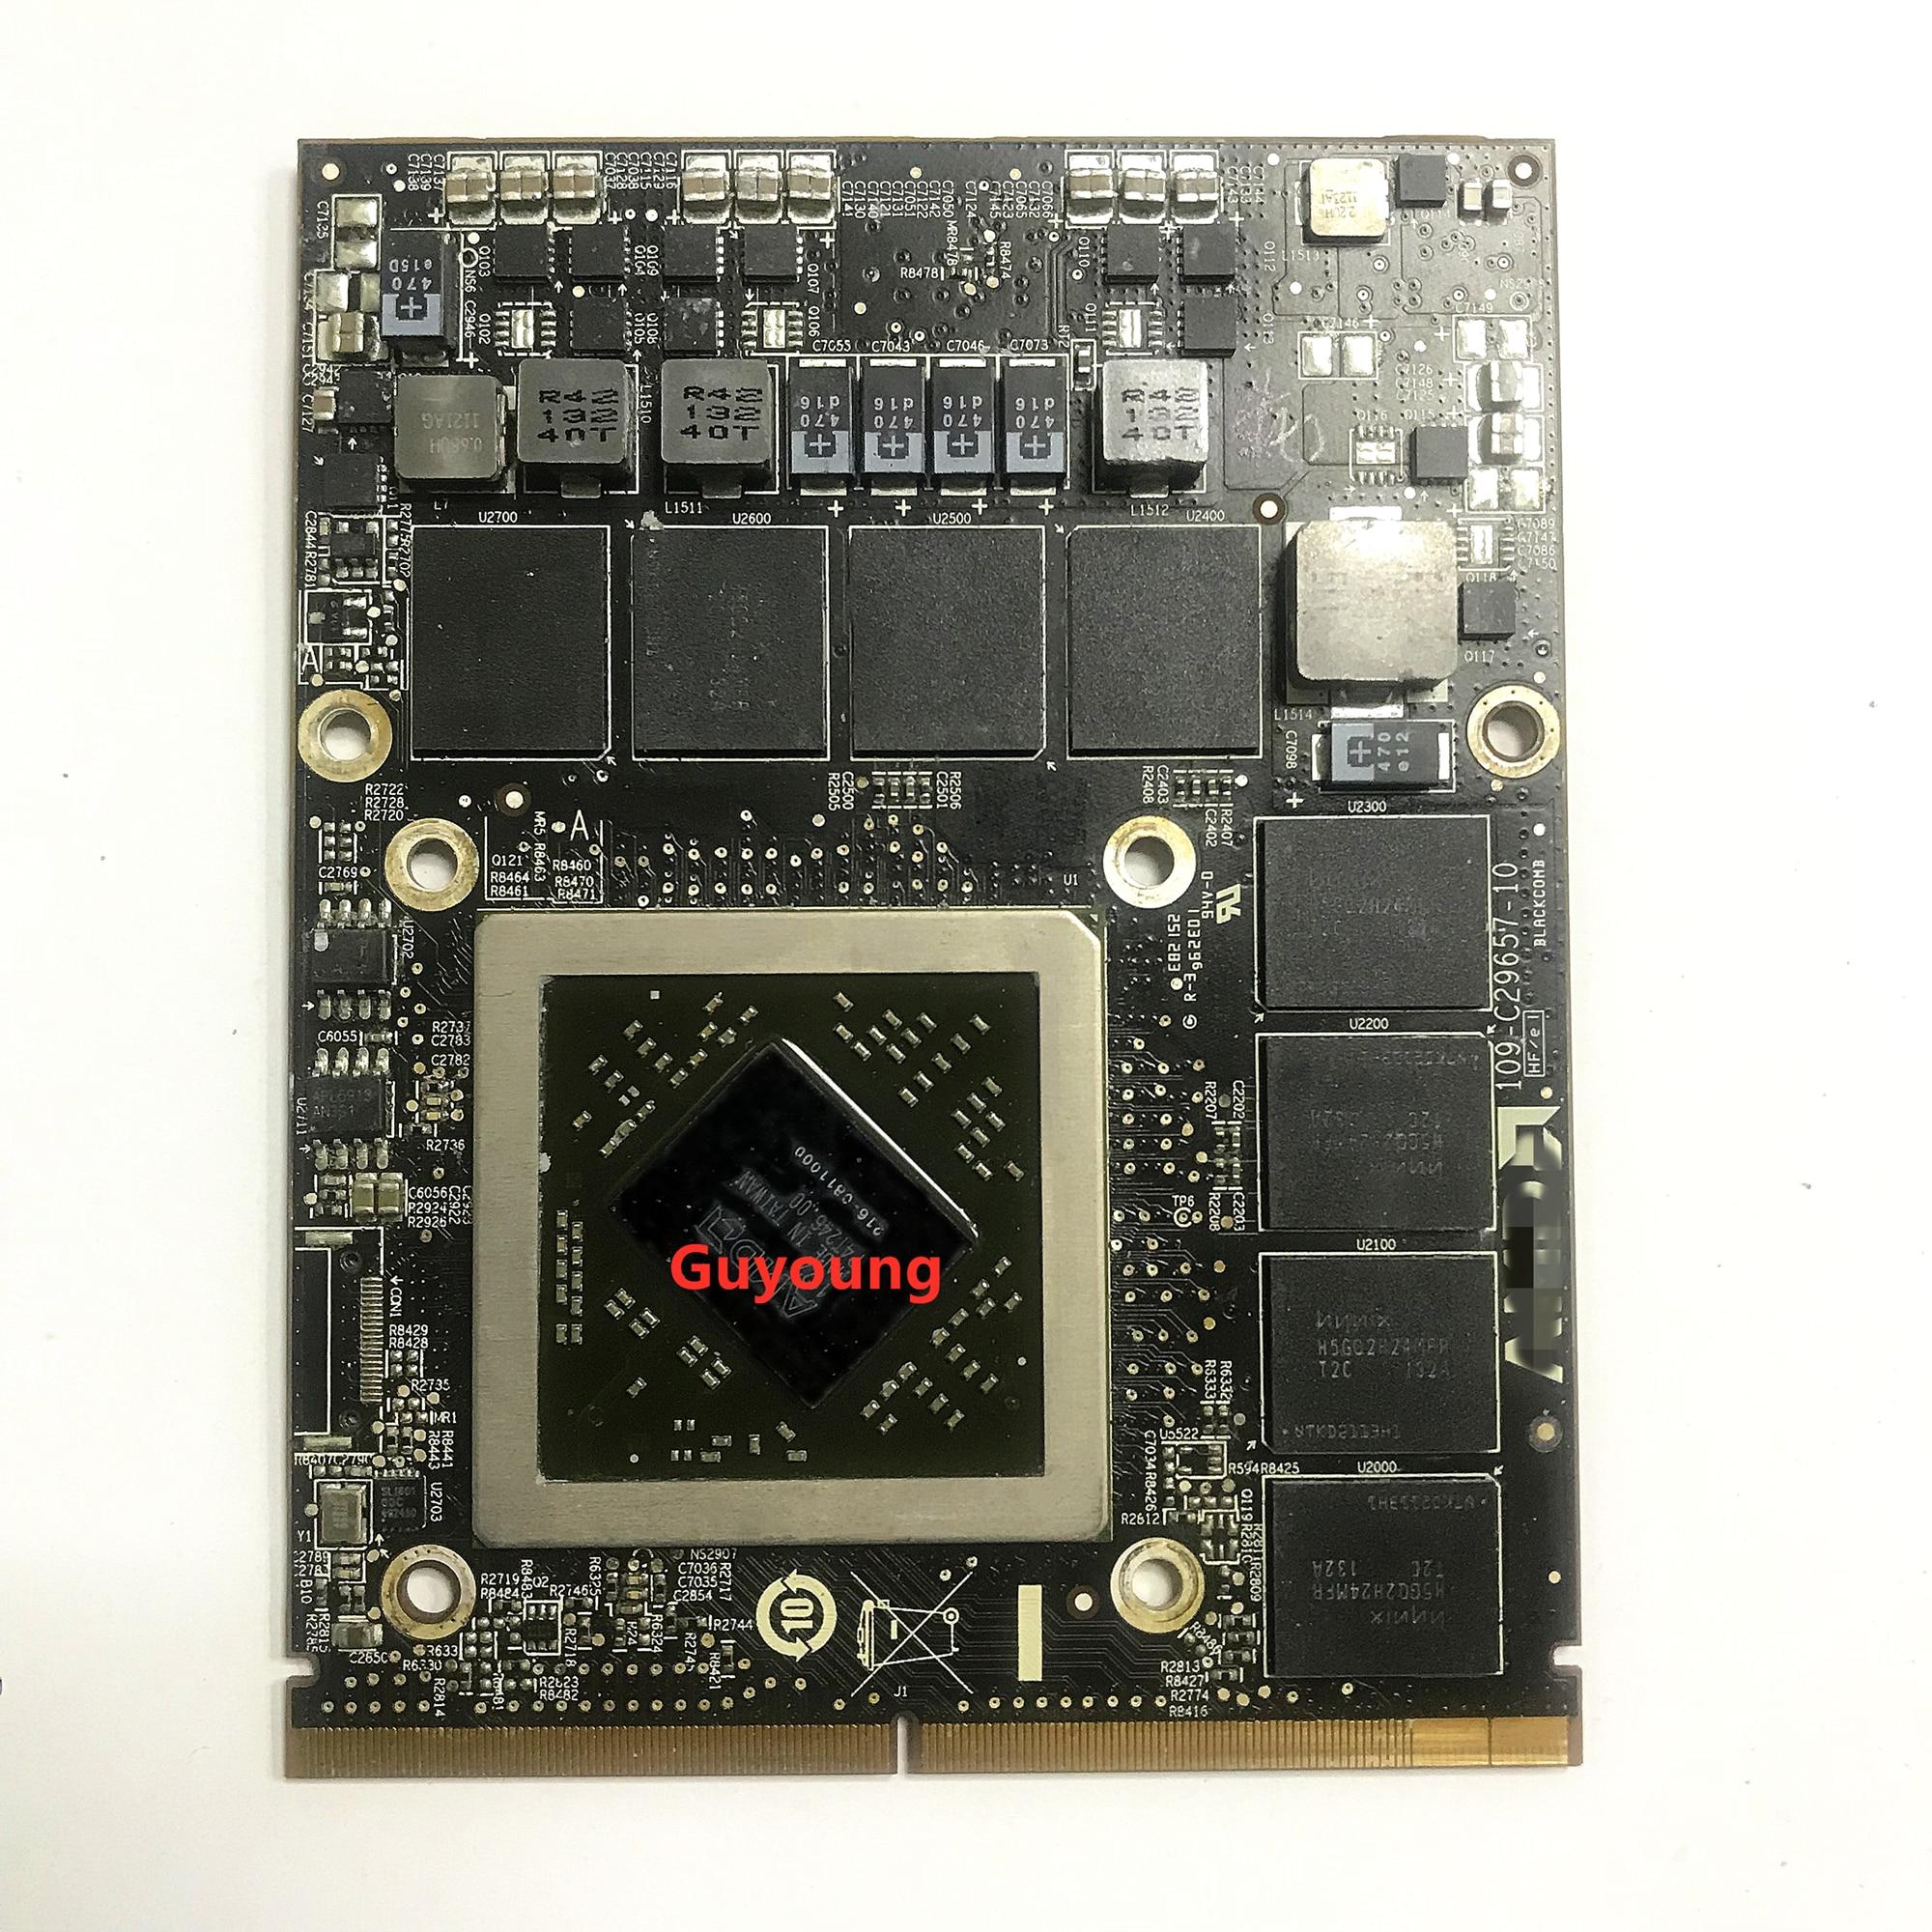 "HD6970 HD6970M 1GB 2GB 216-0811000 Video Graphics Card 109-C29647-00 For Apple iMac 27"" A1312 100% Test OK"